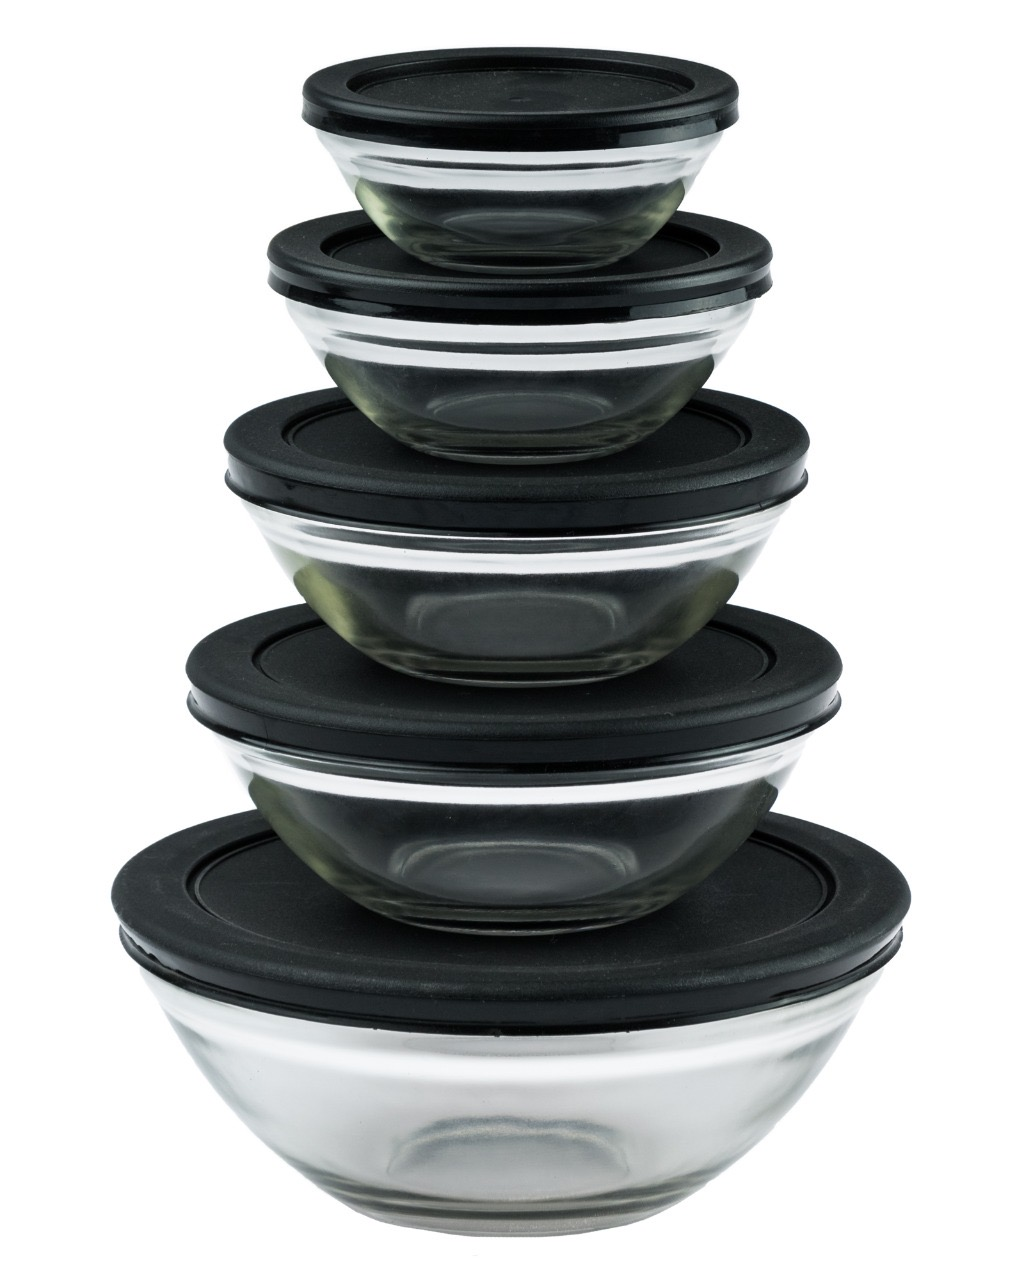 Conjunto de Potes de Vidro 5 Peças - Preto